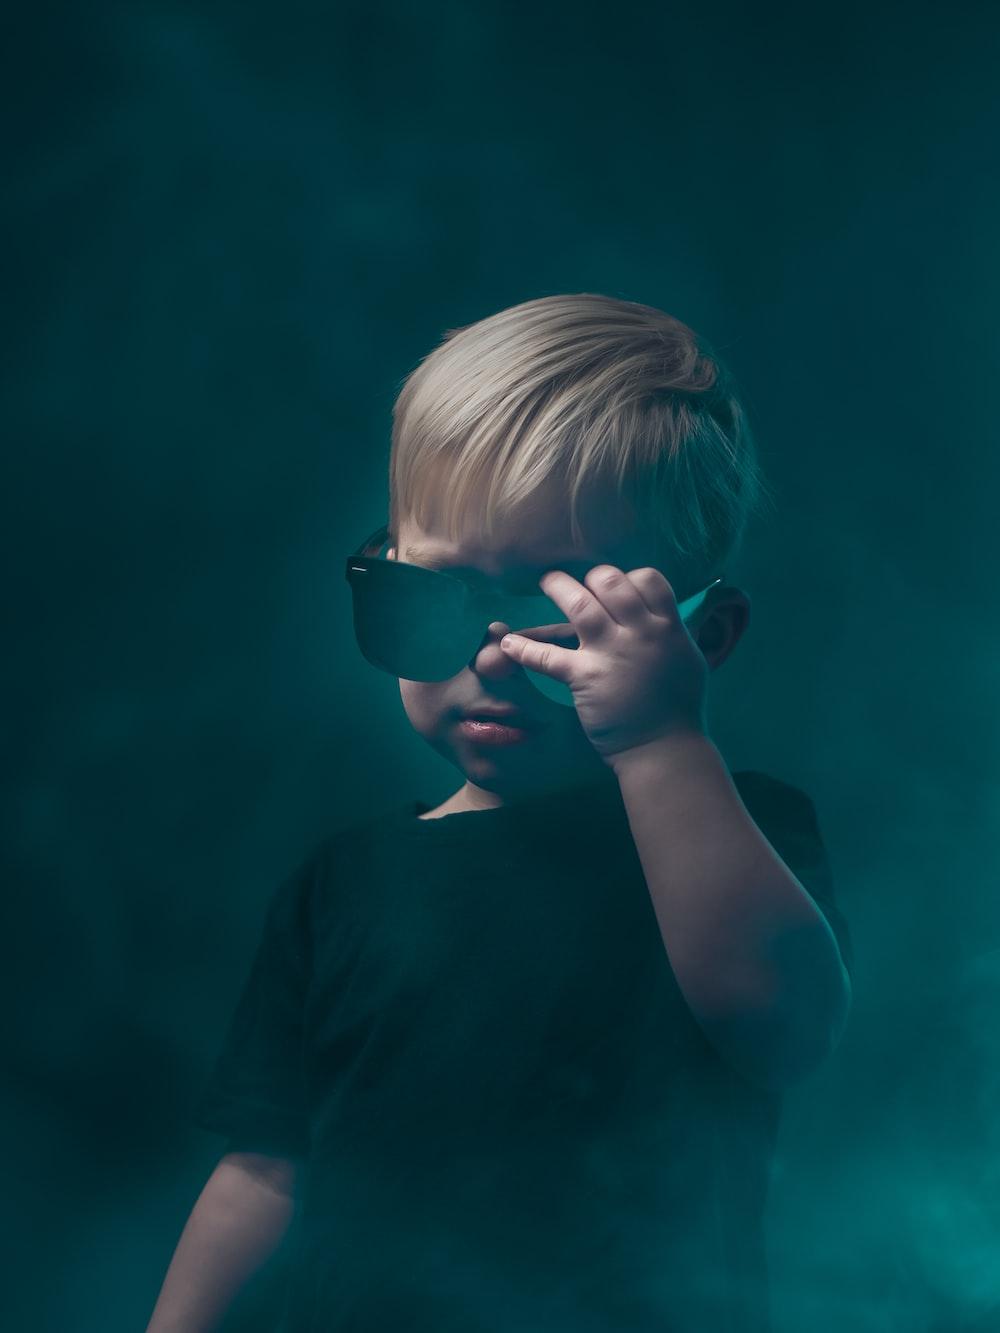 girl in black shirt wearing black sunglasses